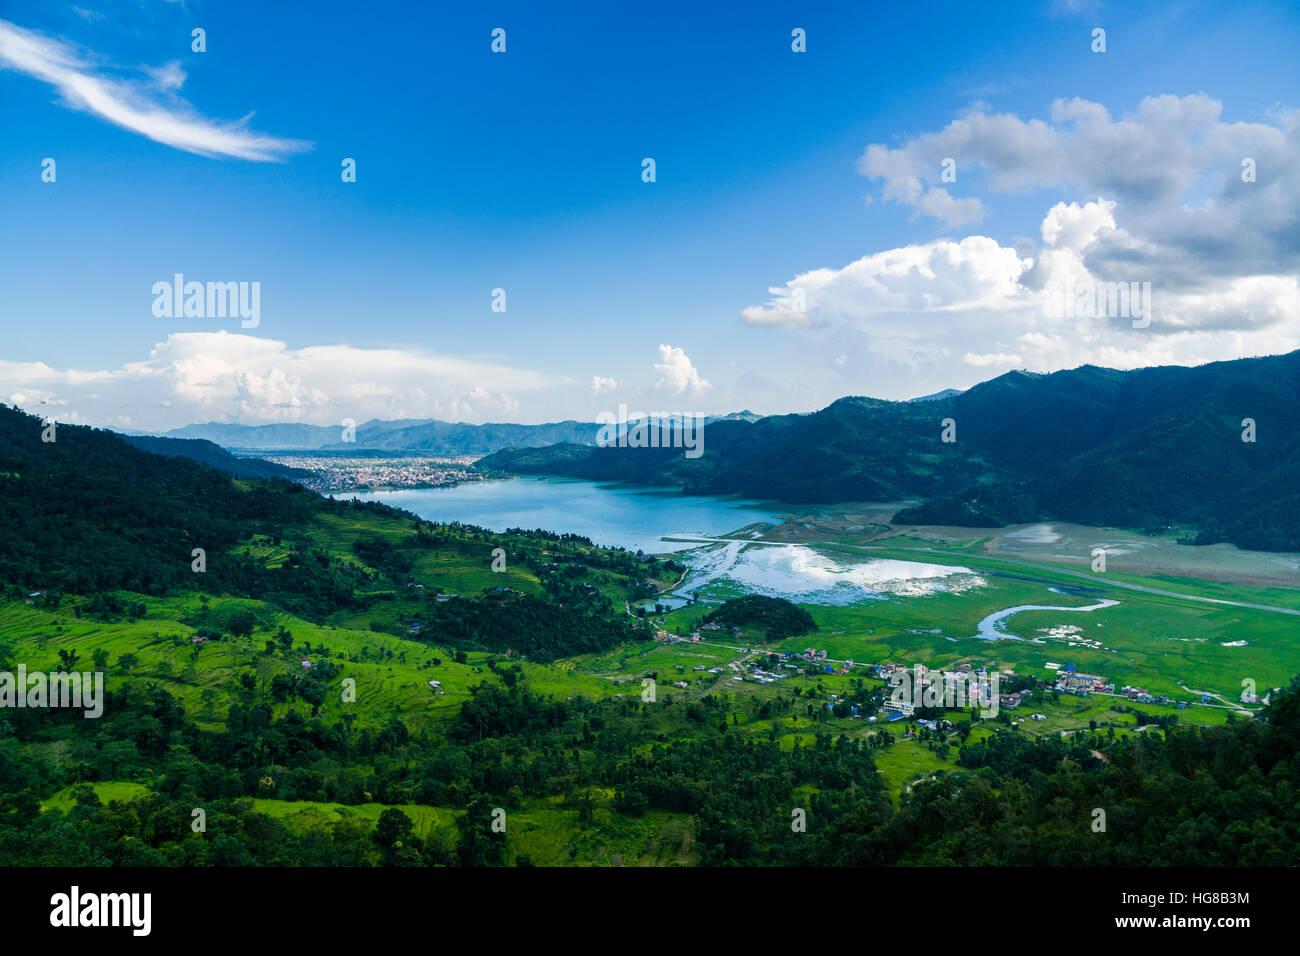 Phewa Lake, Pokhara and agricultural landscape, Pame, Kaski District, Nepal - Stock Image